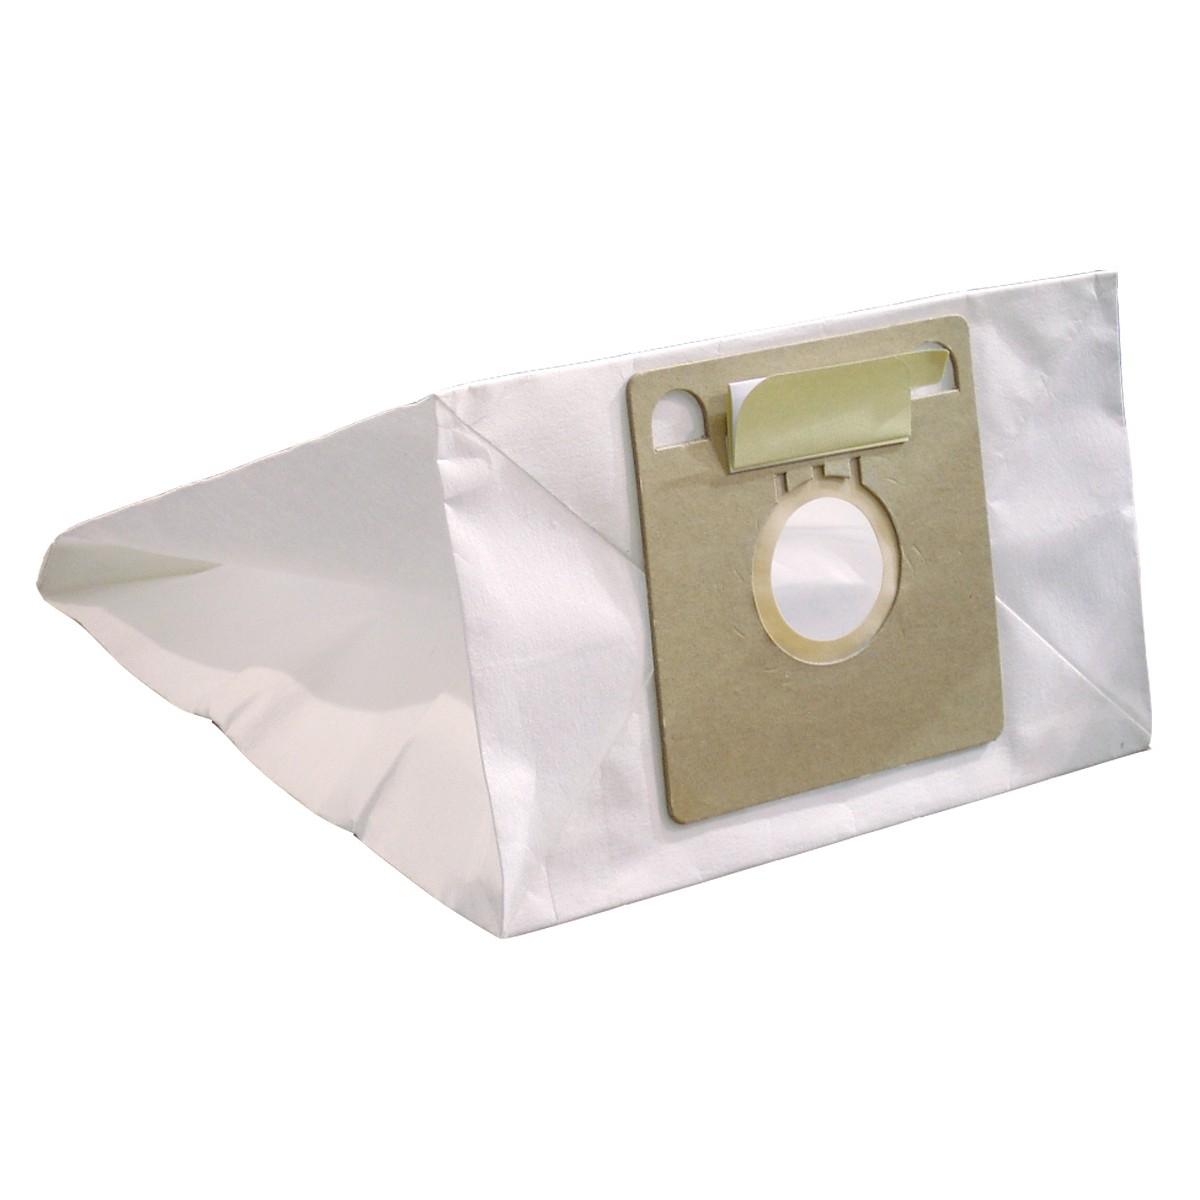 sacs microfiltre pour aspirateur eureka v paq 3. Black Bedroom Furniture Sets. Home Design Ideas